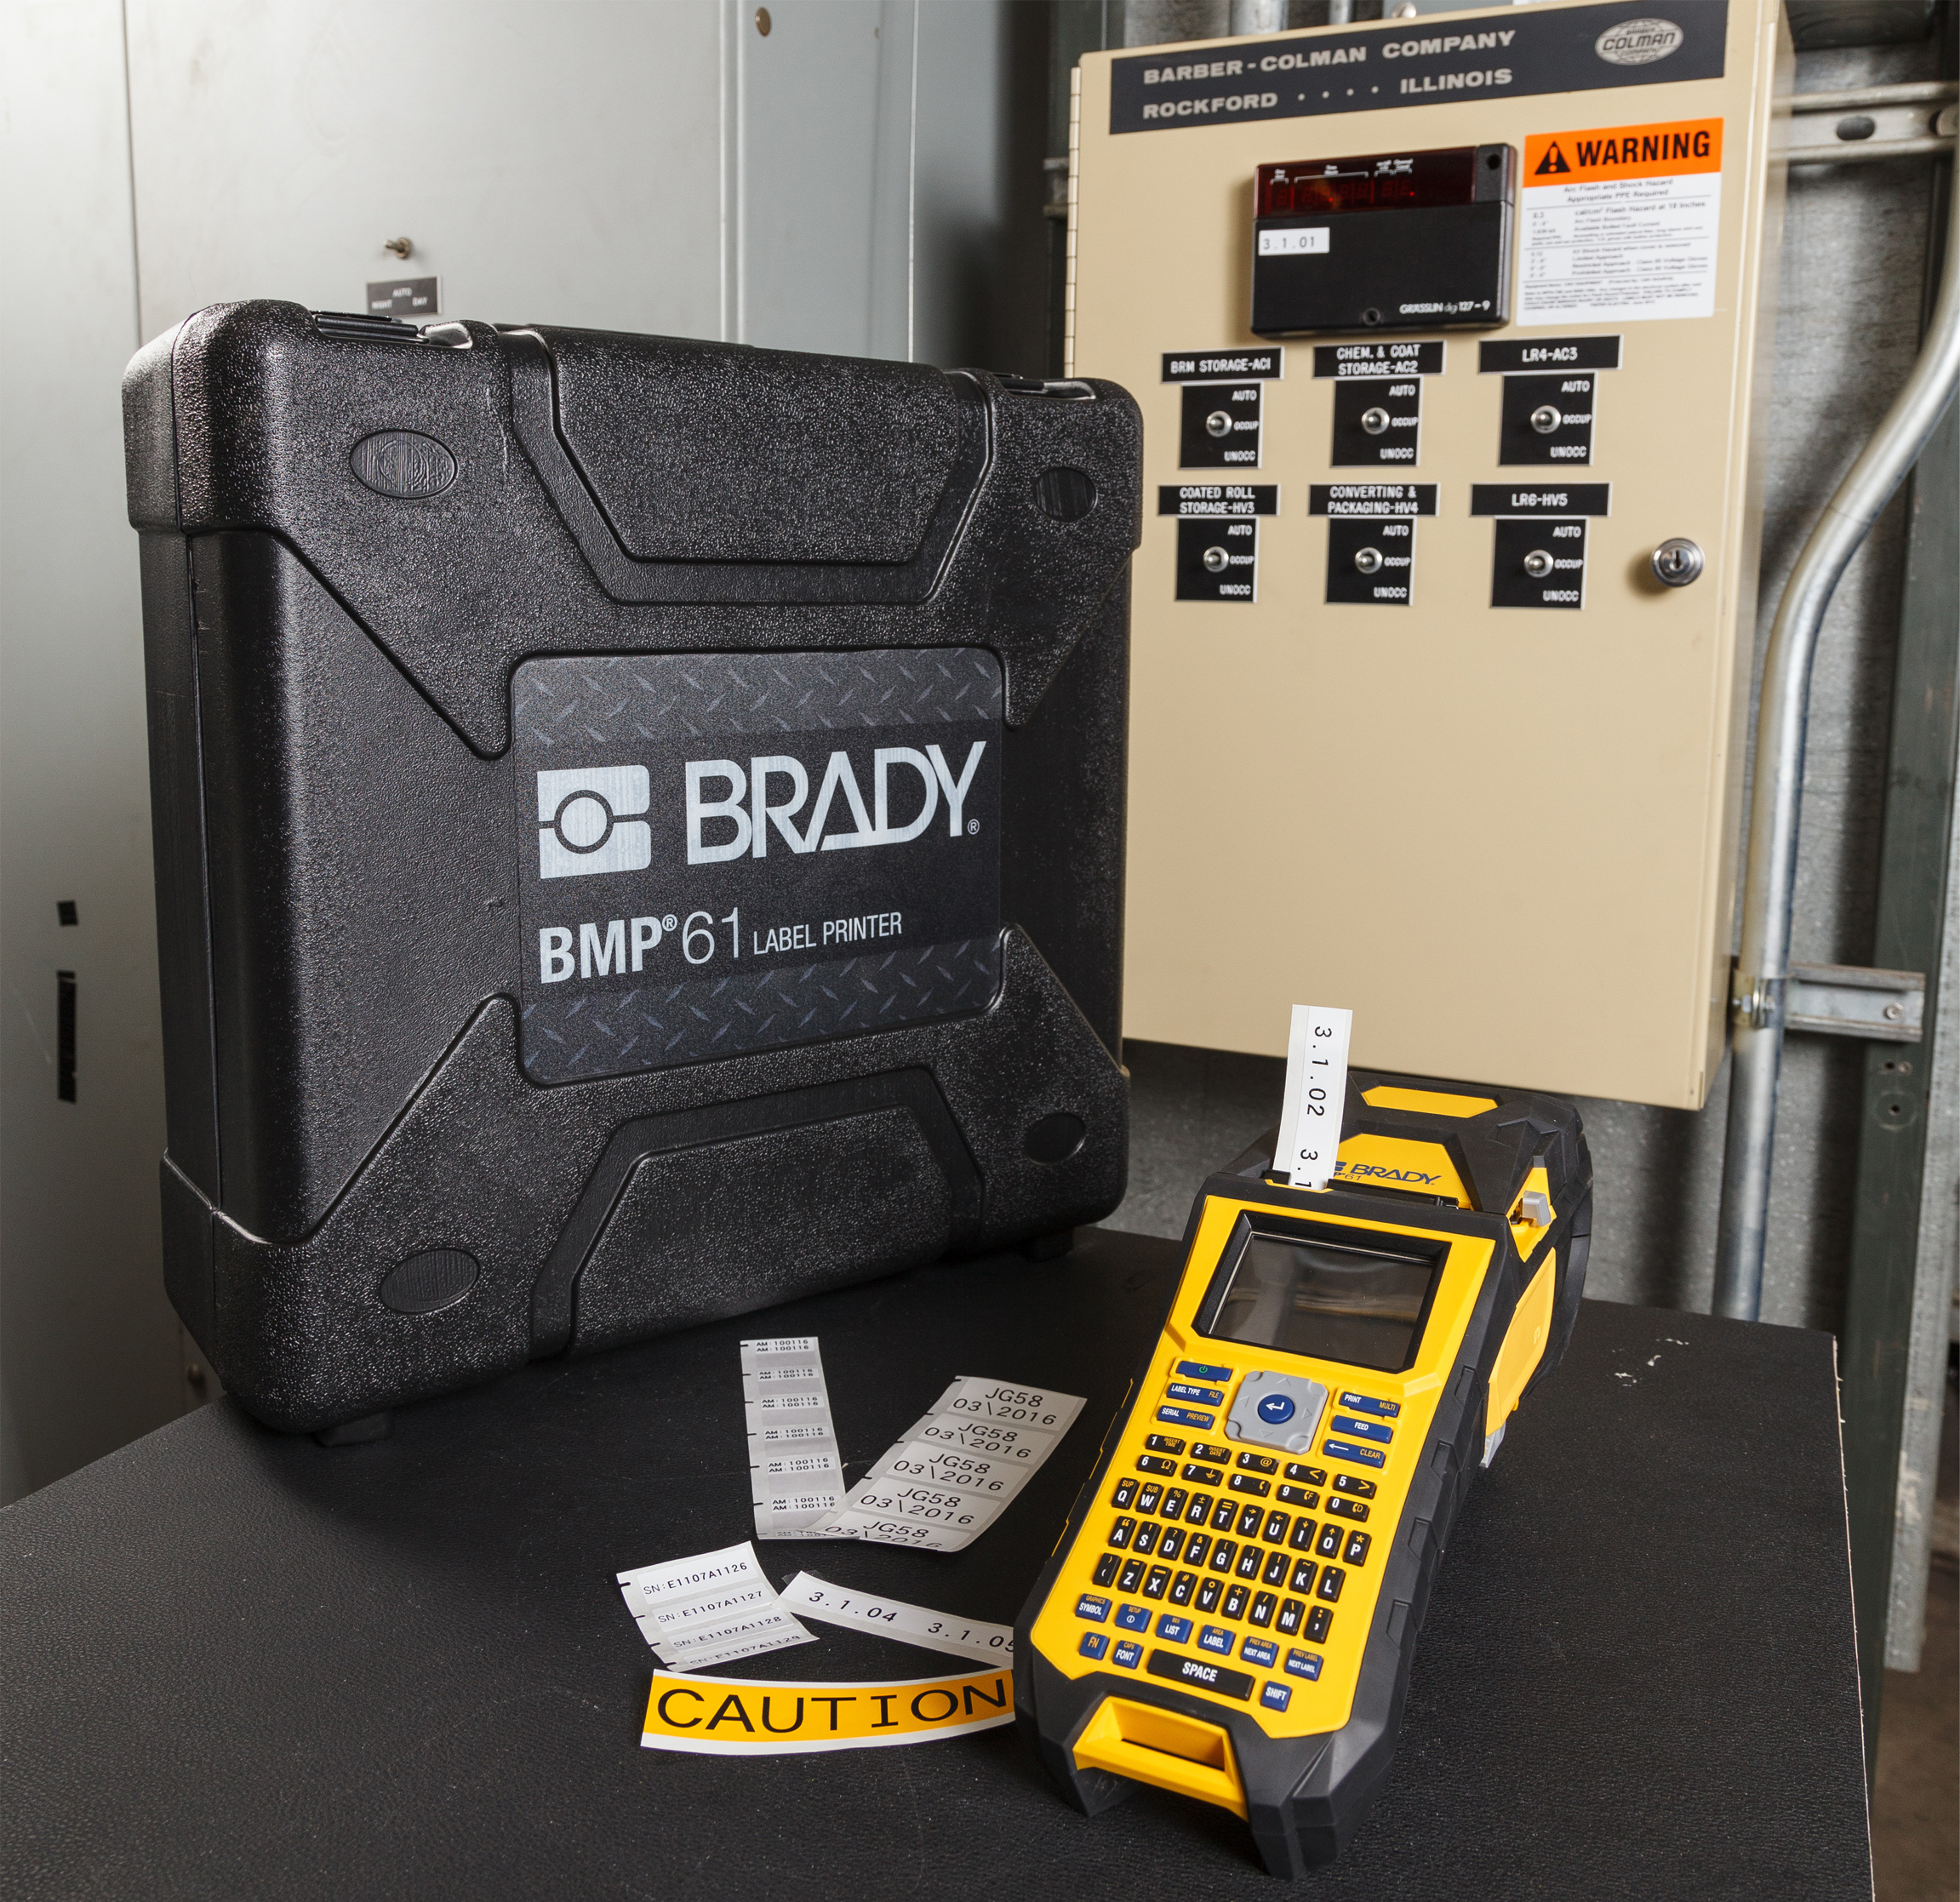 Imprimante d'identification Brady BMP 61